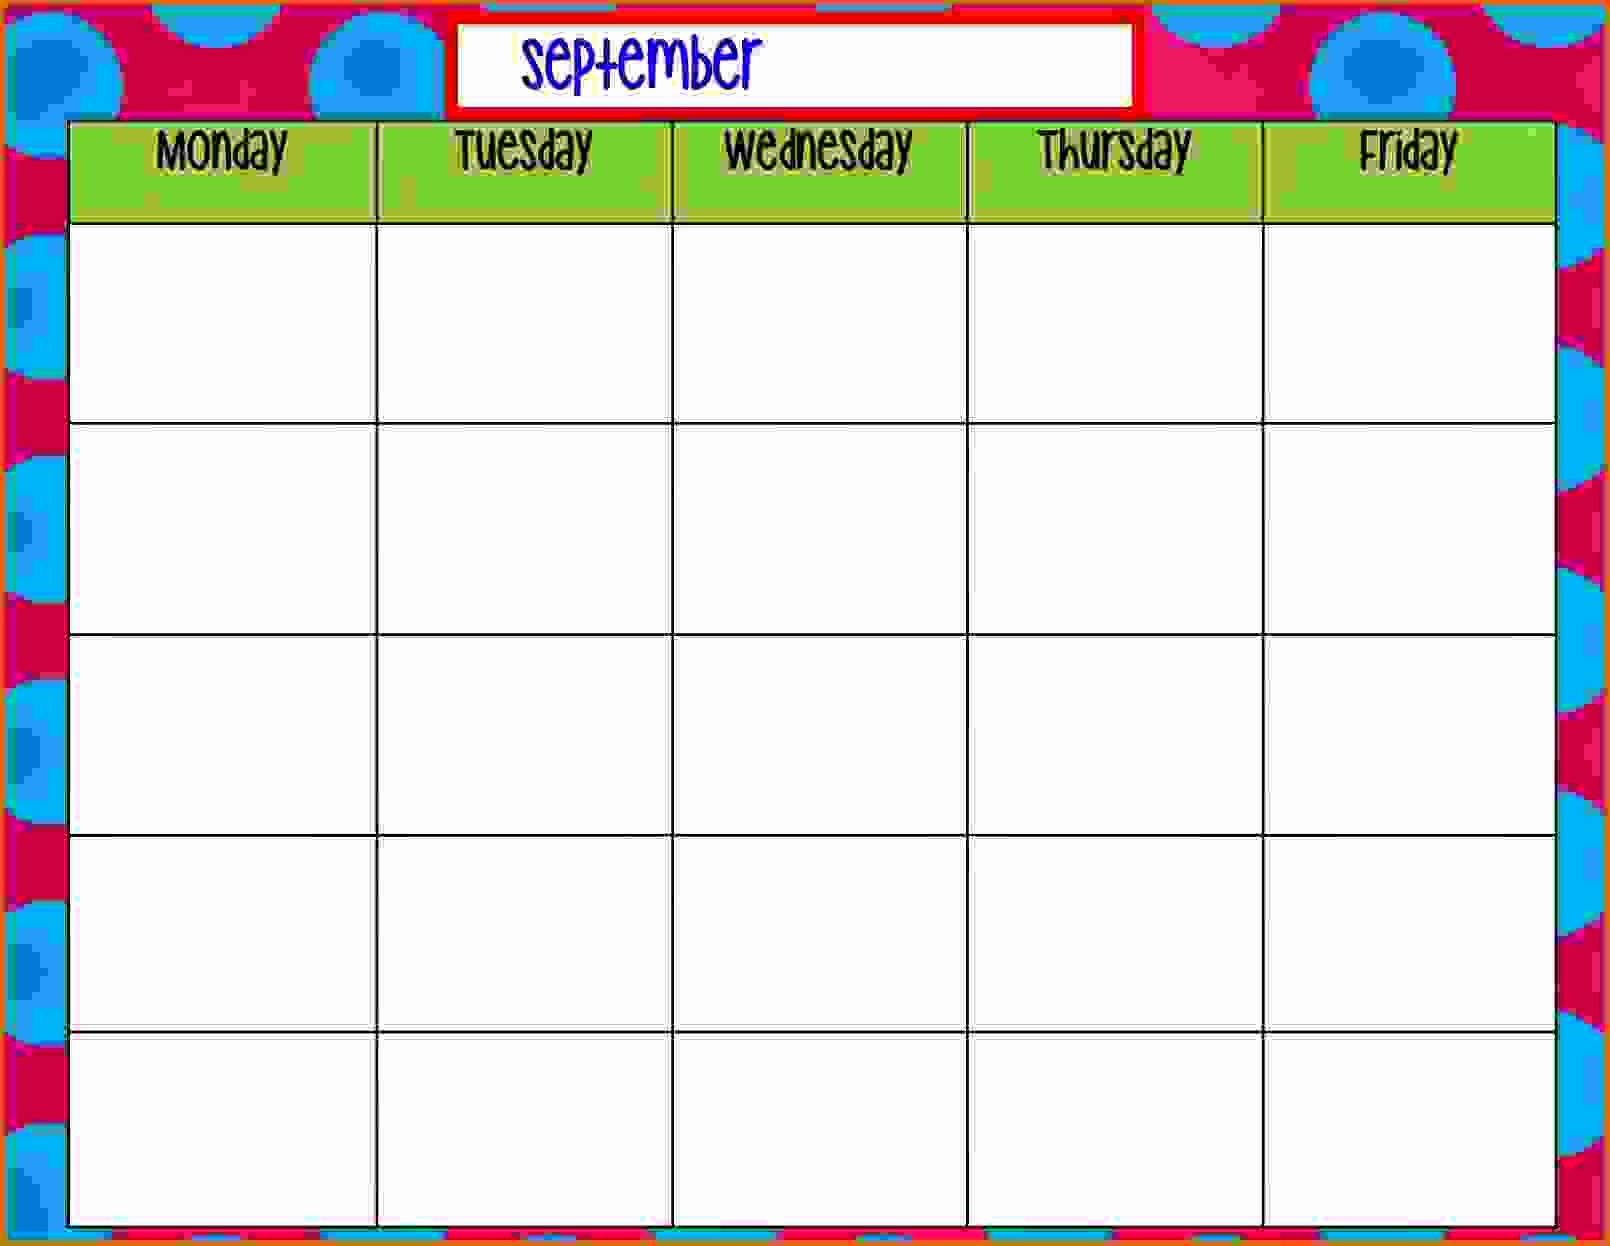 Weekly Calendar Monday Through Friday Luxury 11 Monday Through Friday Printable Calendar